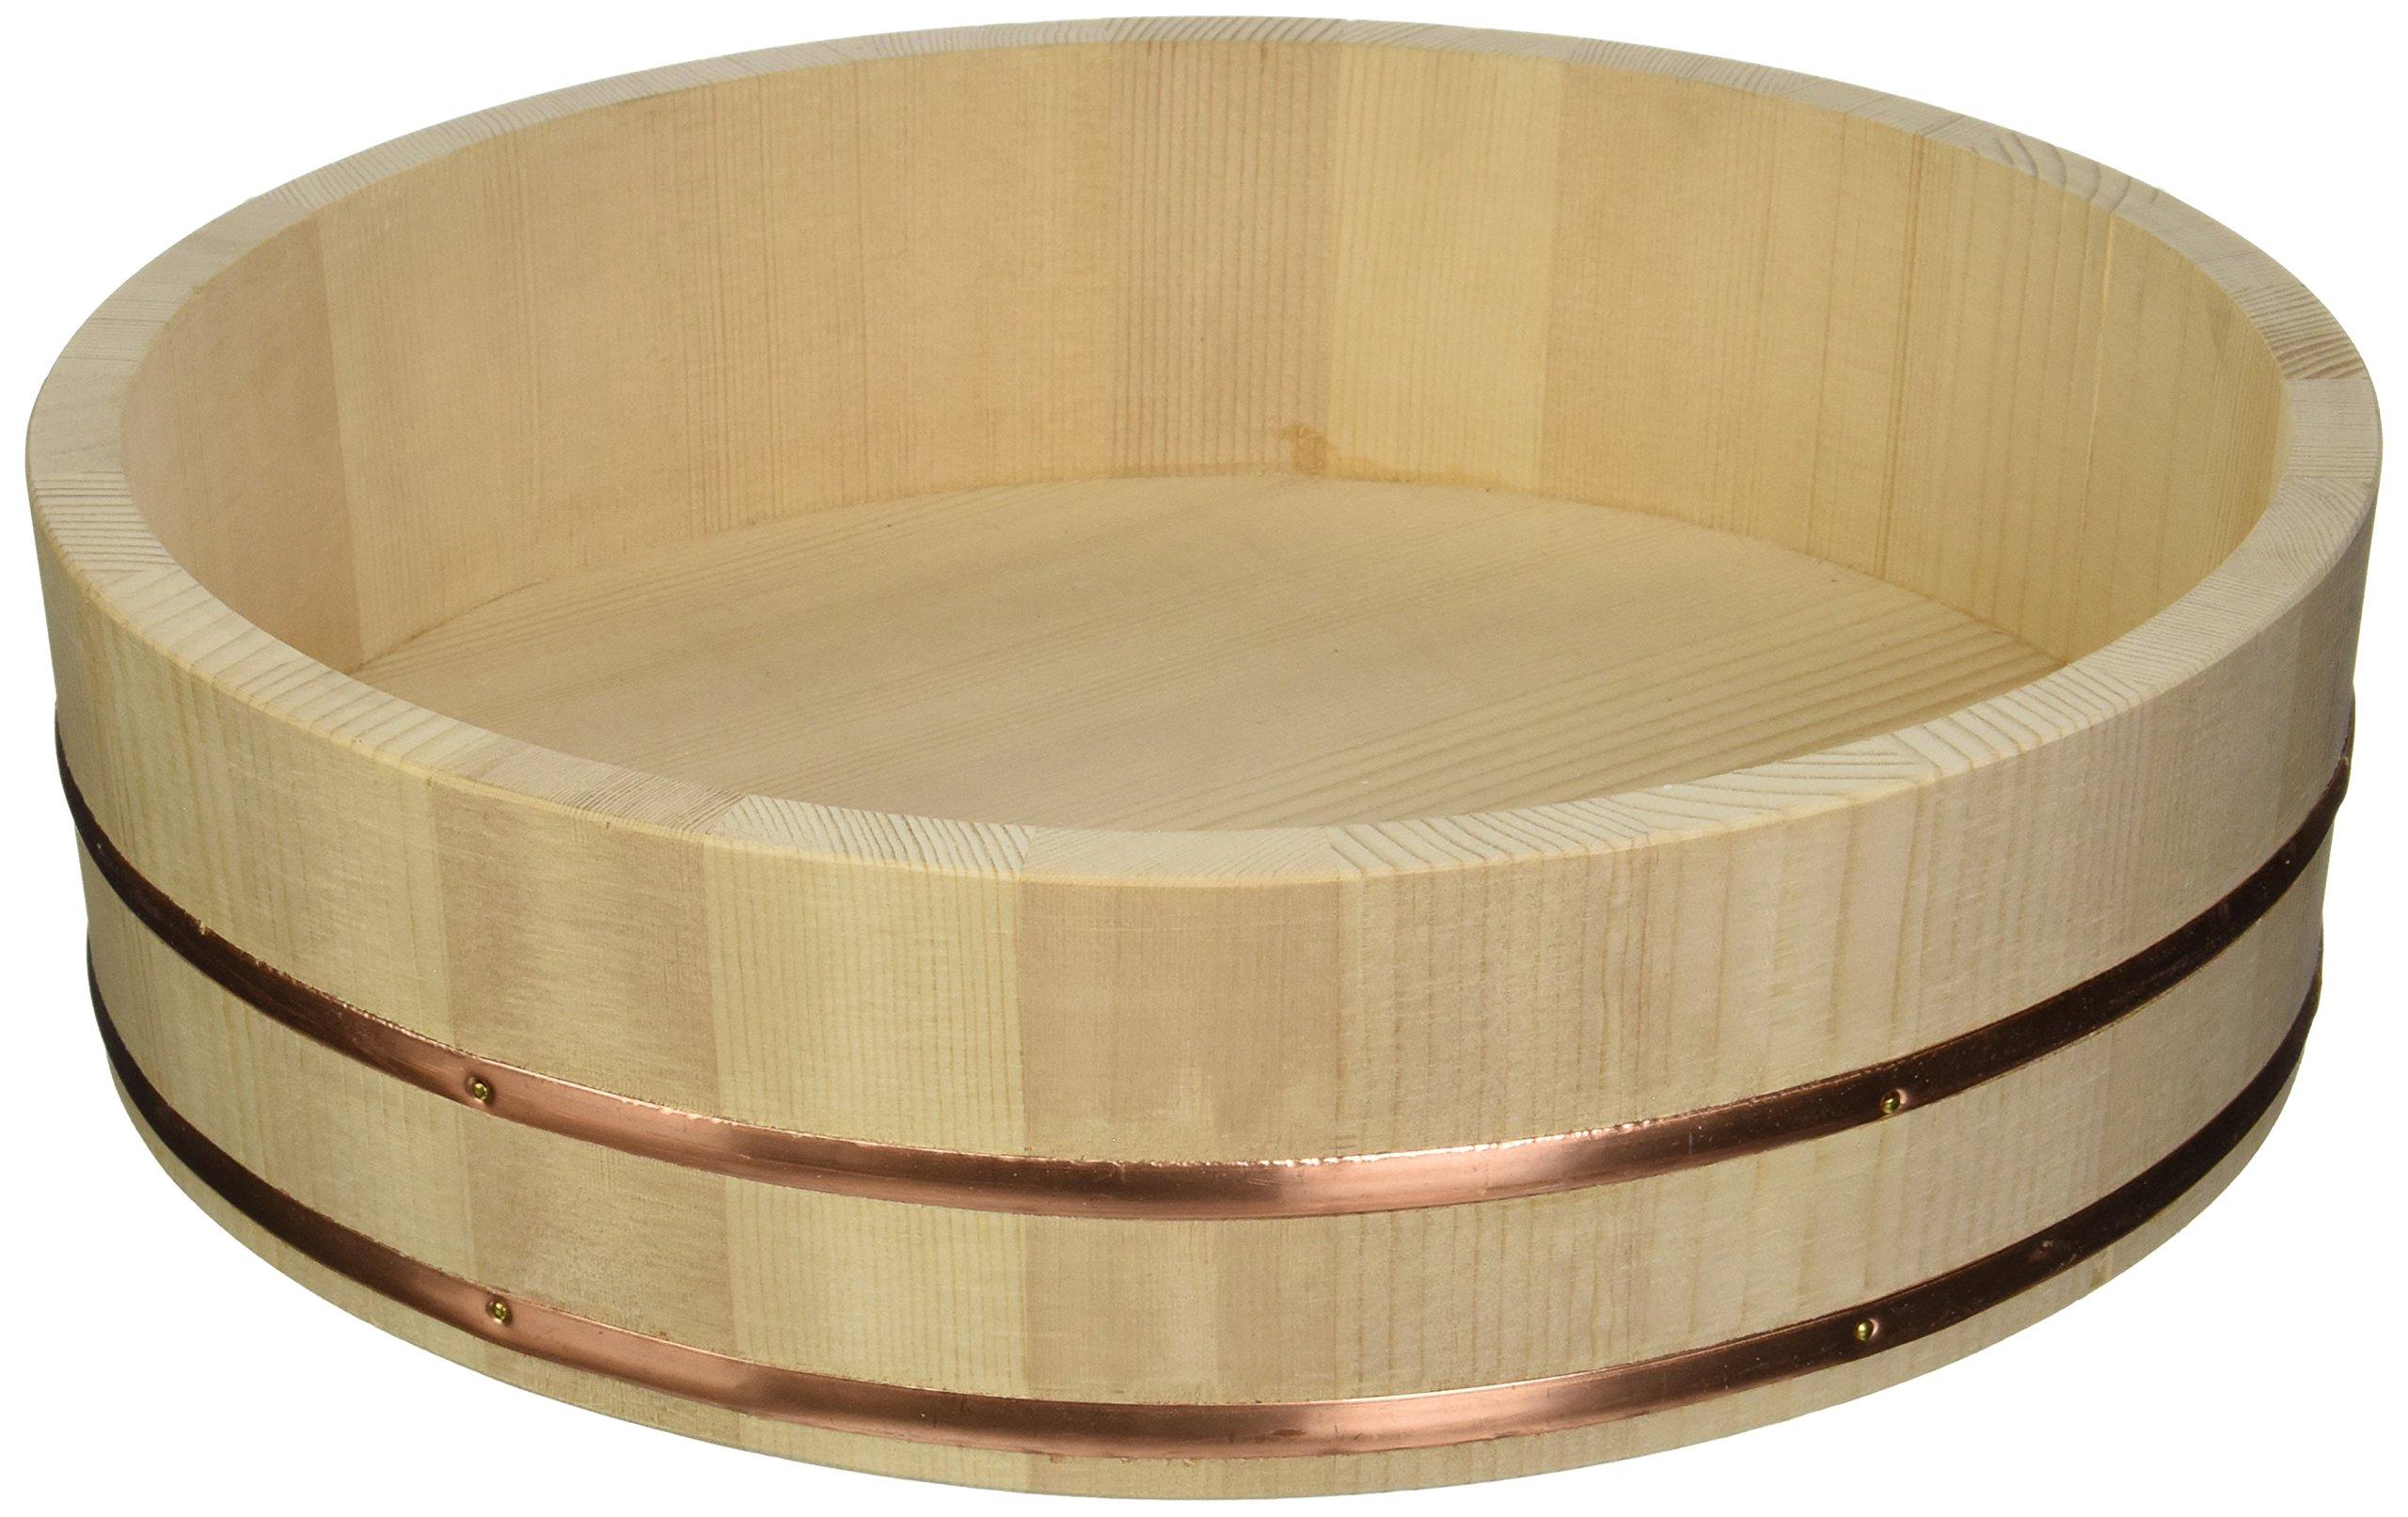 "Happy Sales Wooden Sushi Oke Hangiri Mixing Bowl, 14"", Natural"